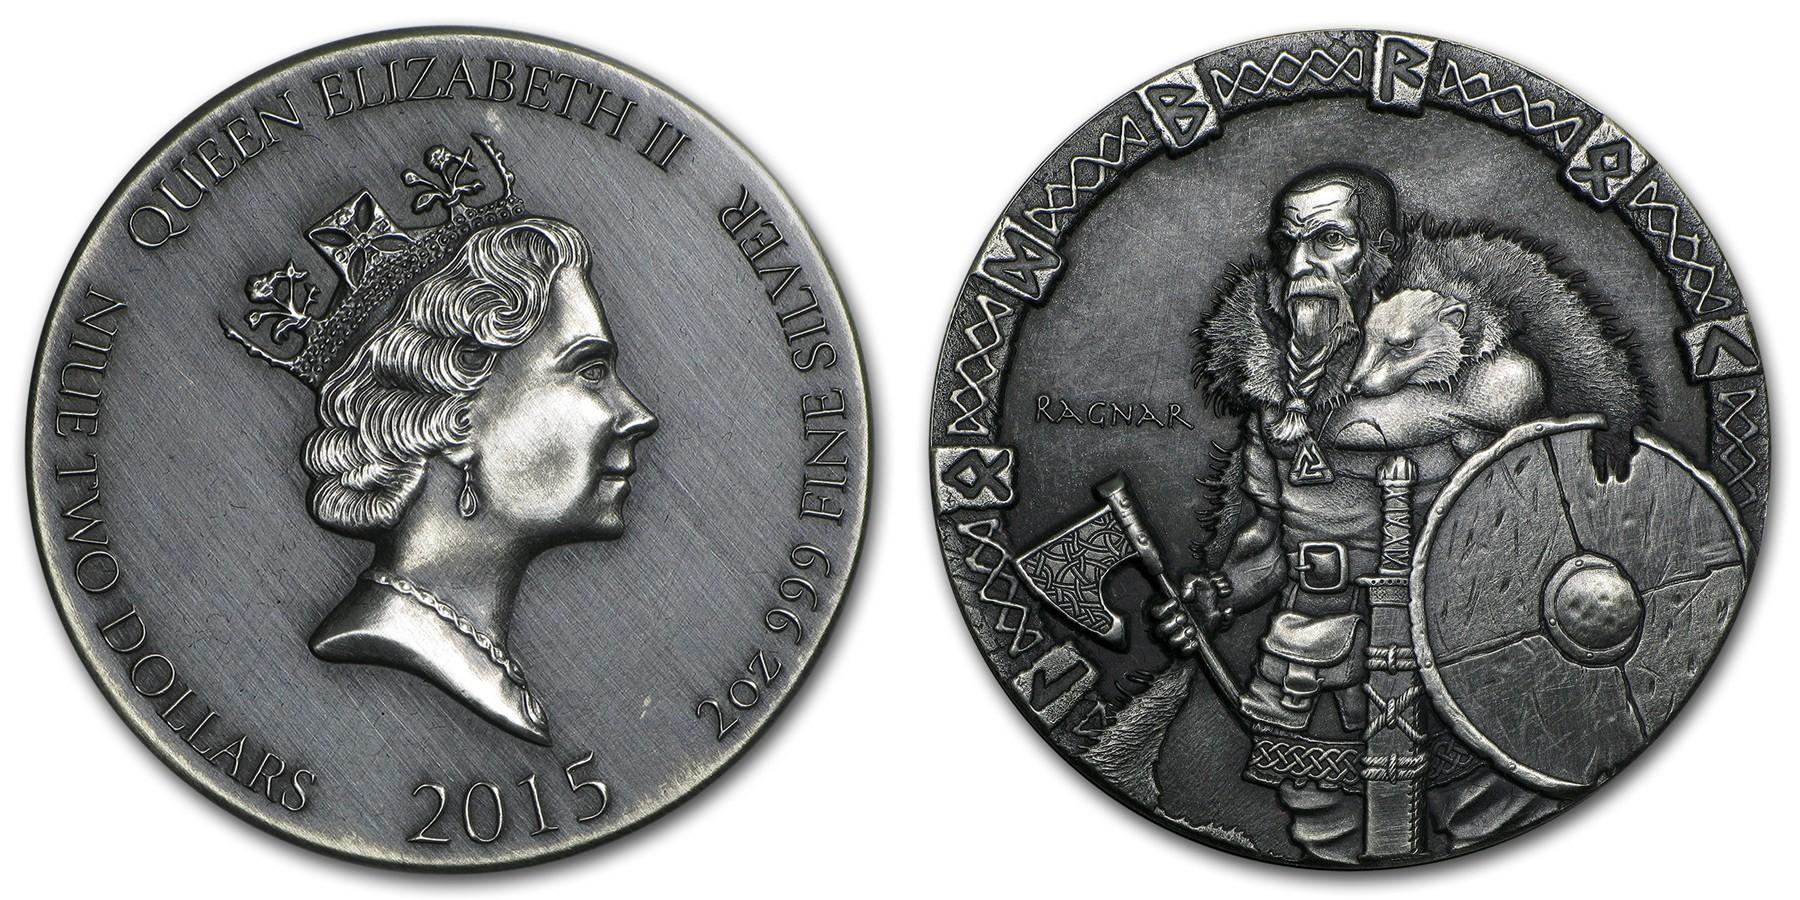 niue 2015 vikings guerrier ragnar